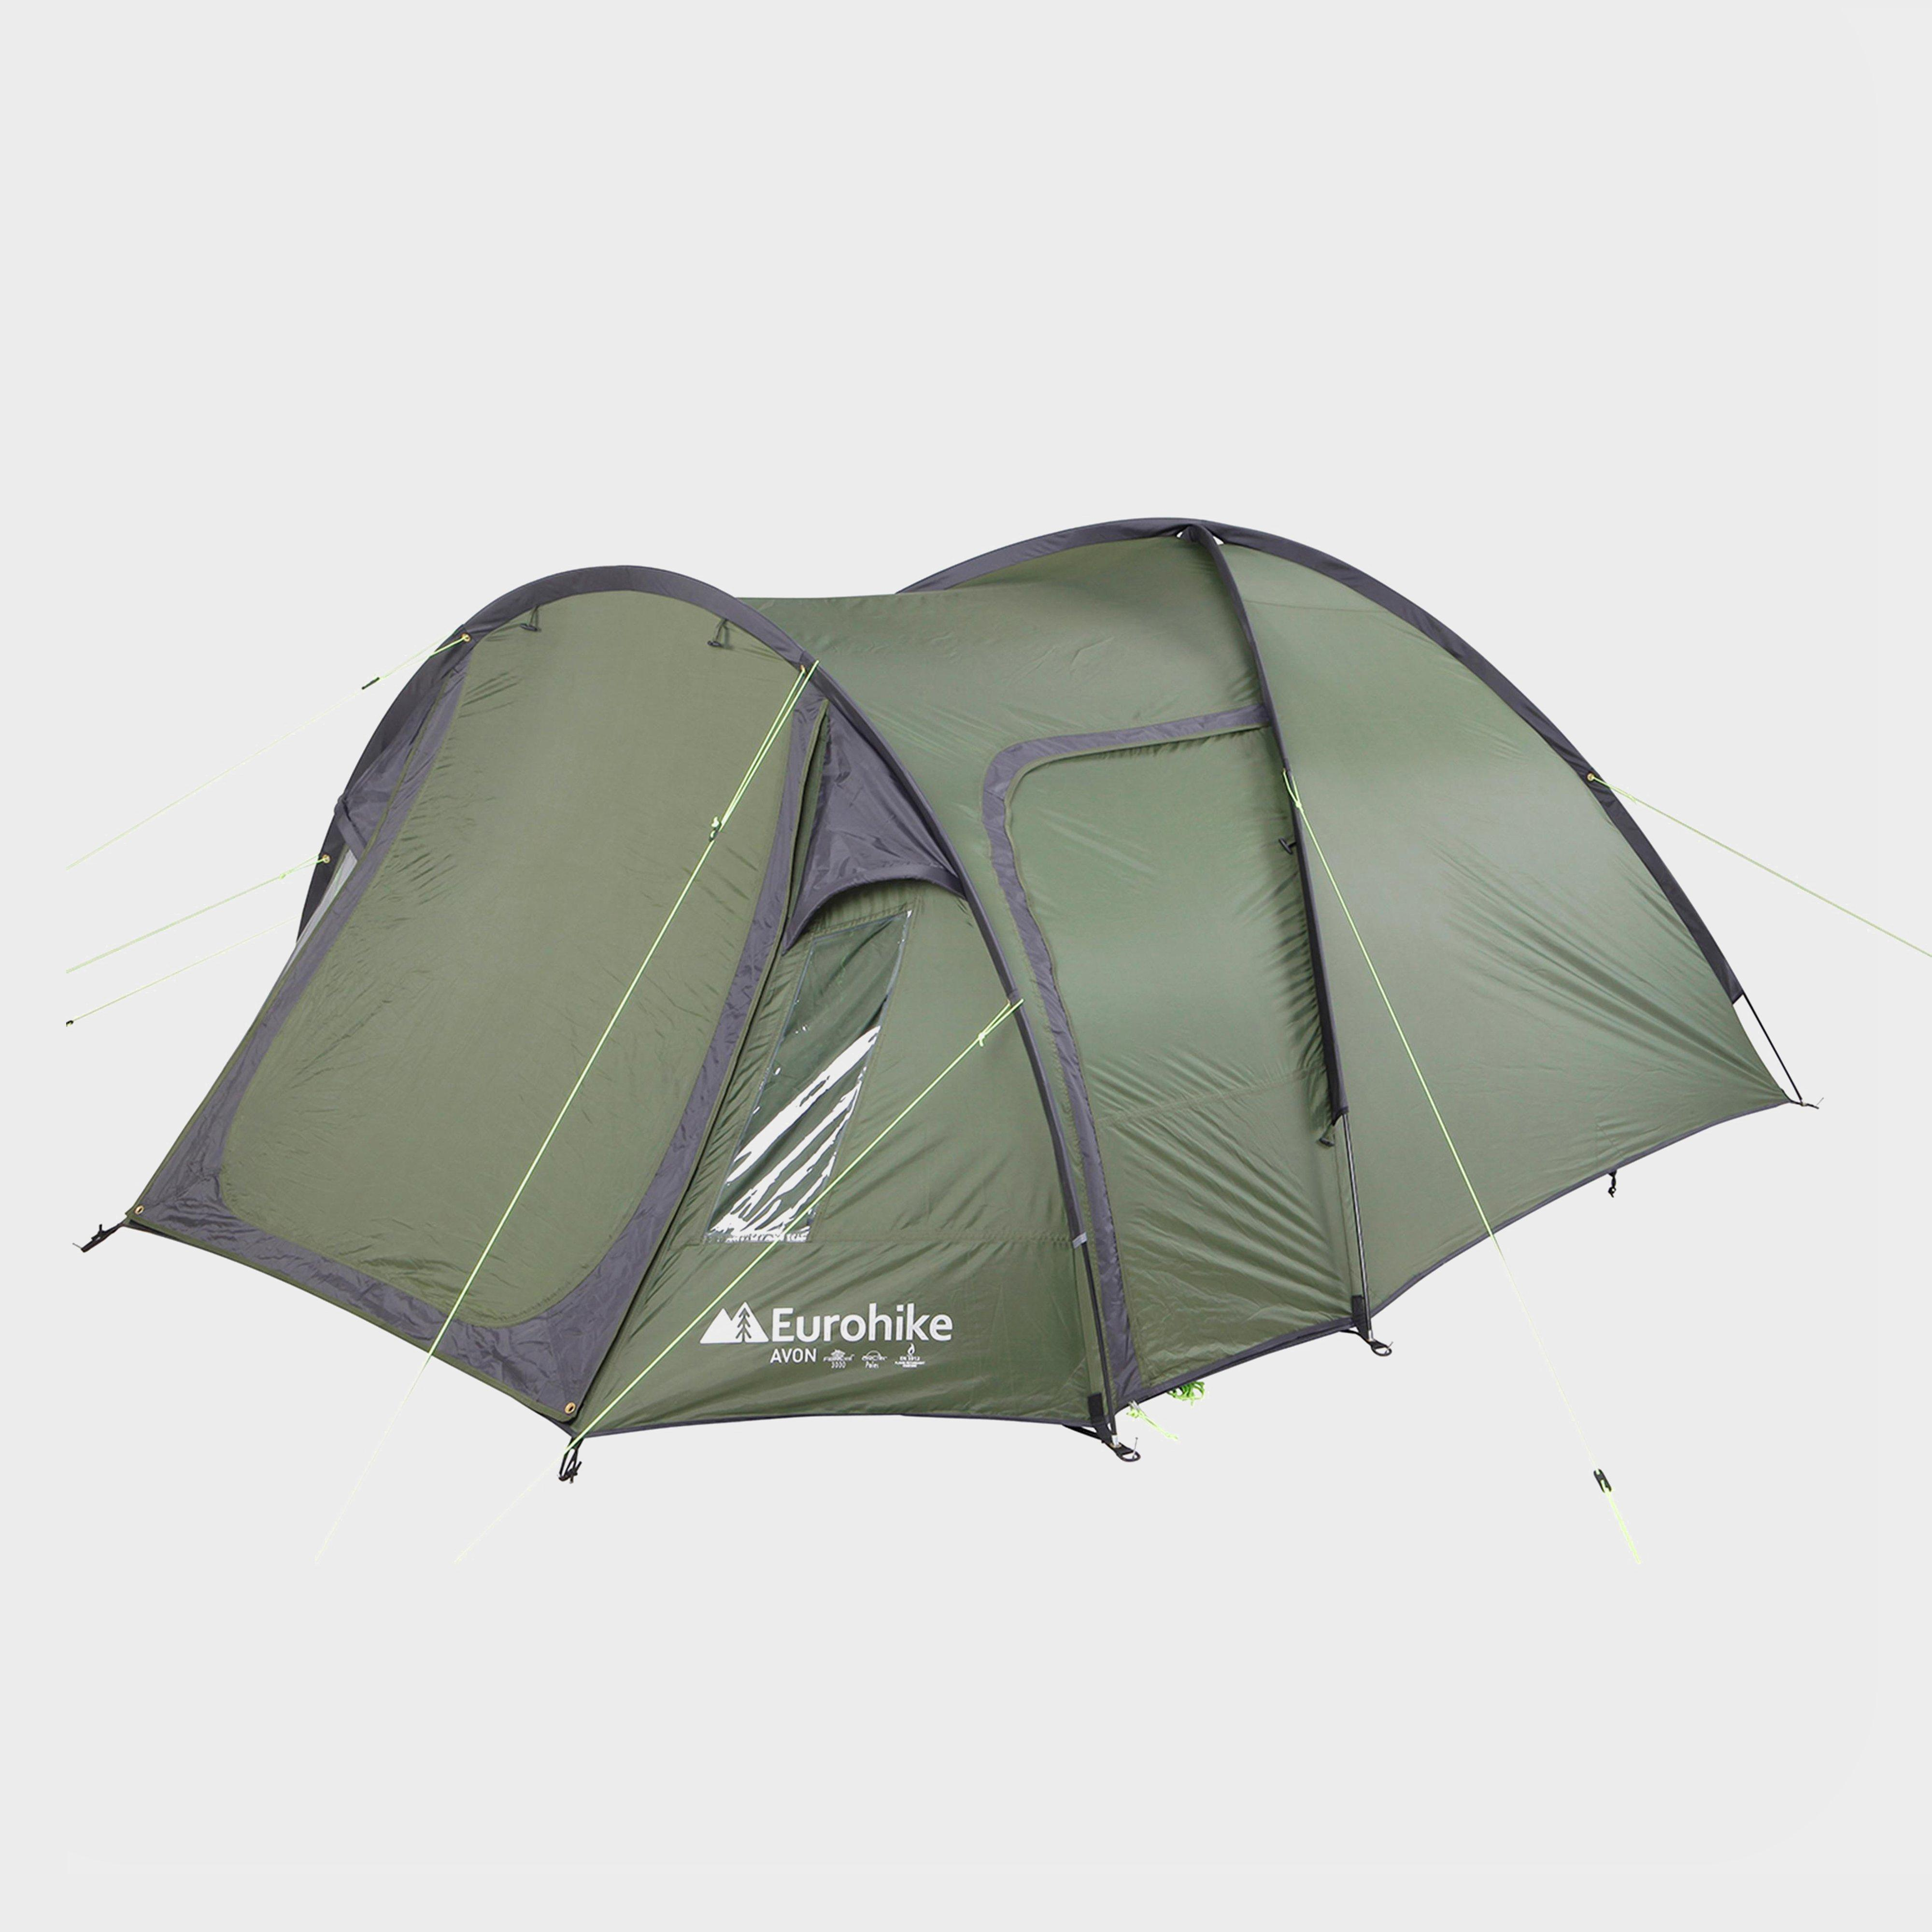 EUROHIKE Avon DLX 3 Man Tent  sc 1 st  Blacks & Festival Tents | Blacks